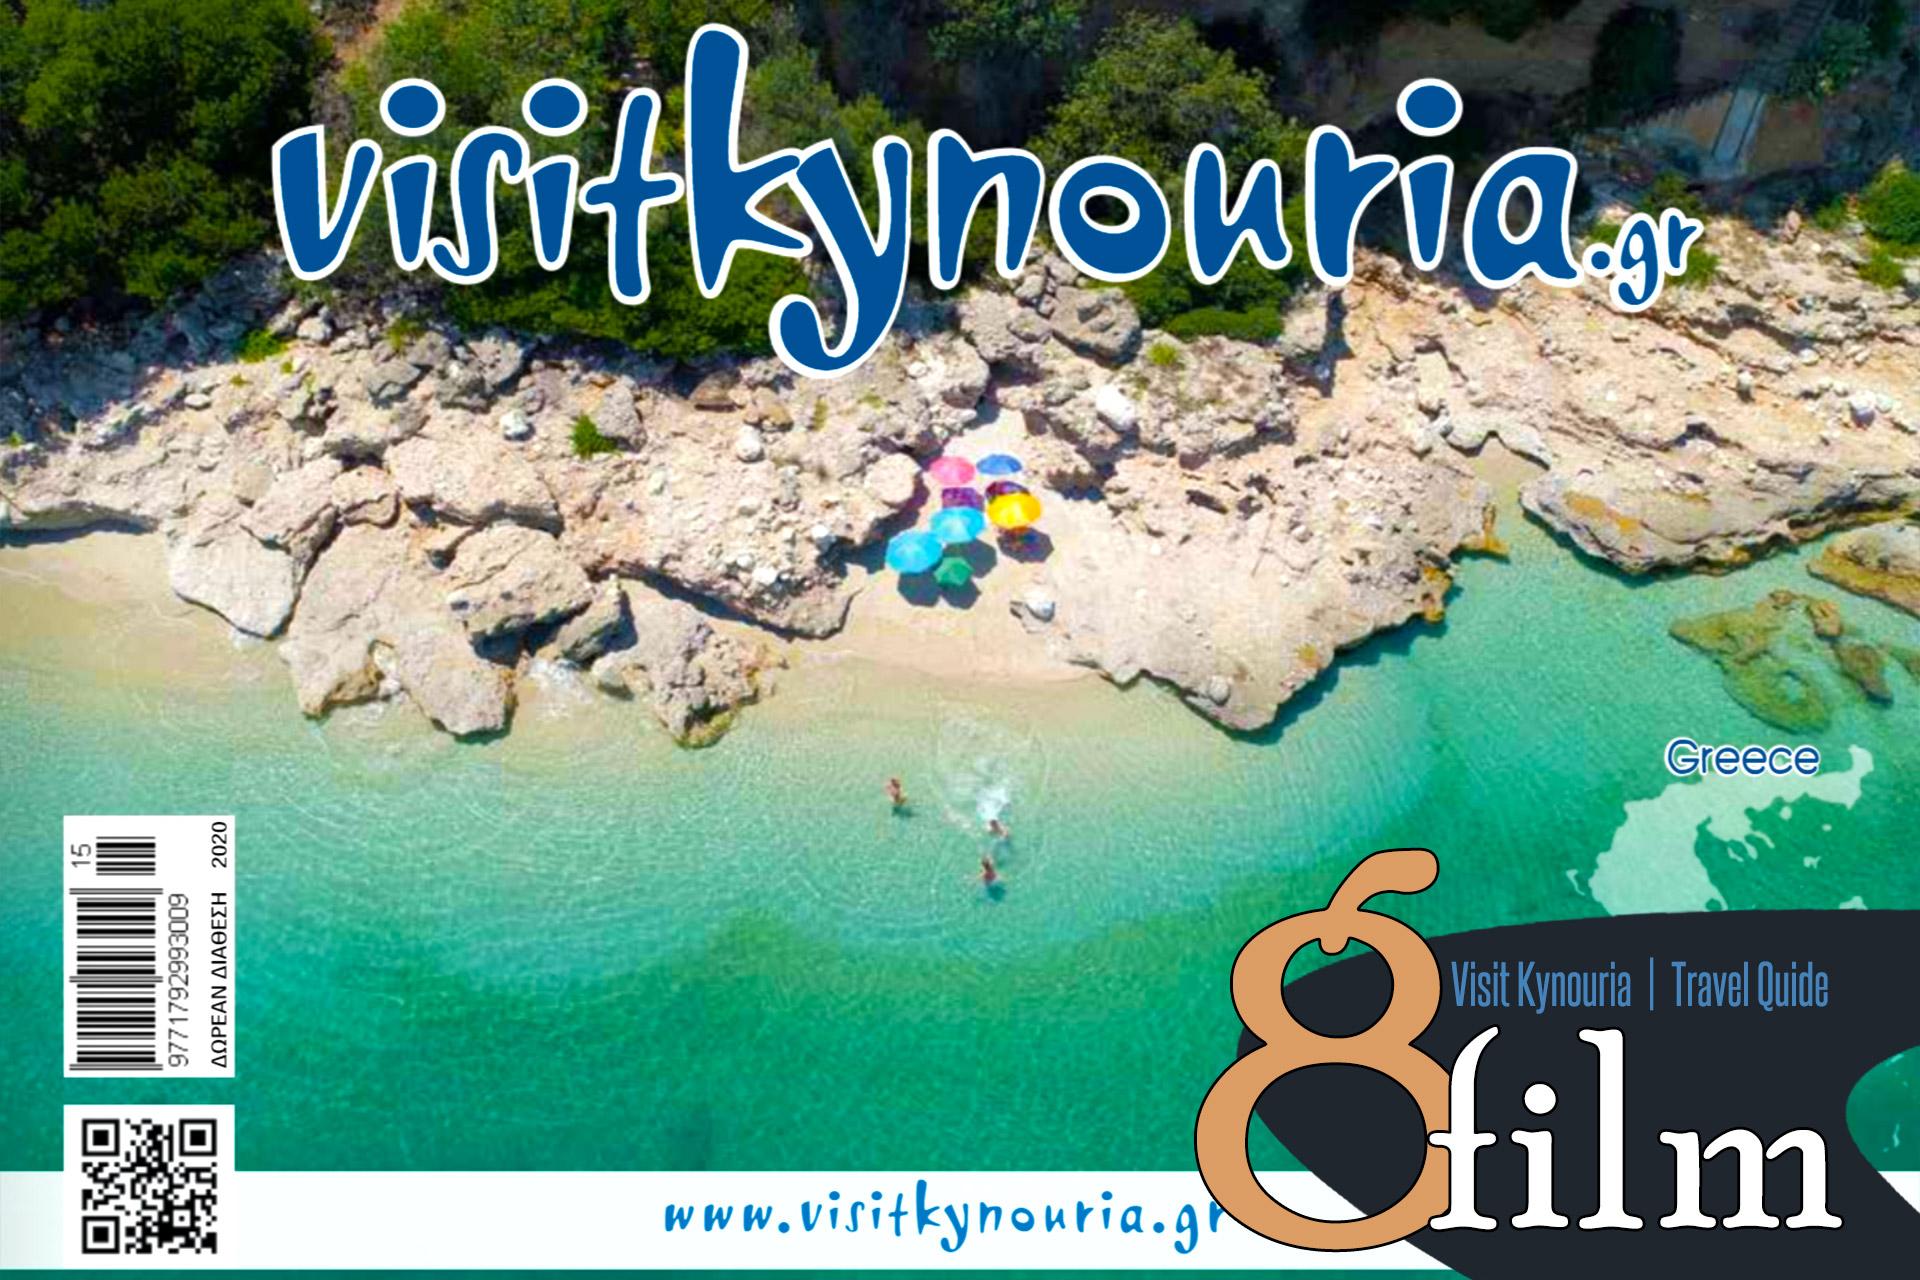 Visit Kynouria Travel Guide Chris Giatrakos